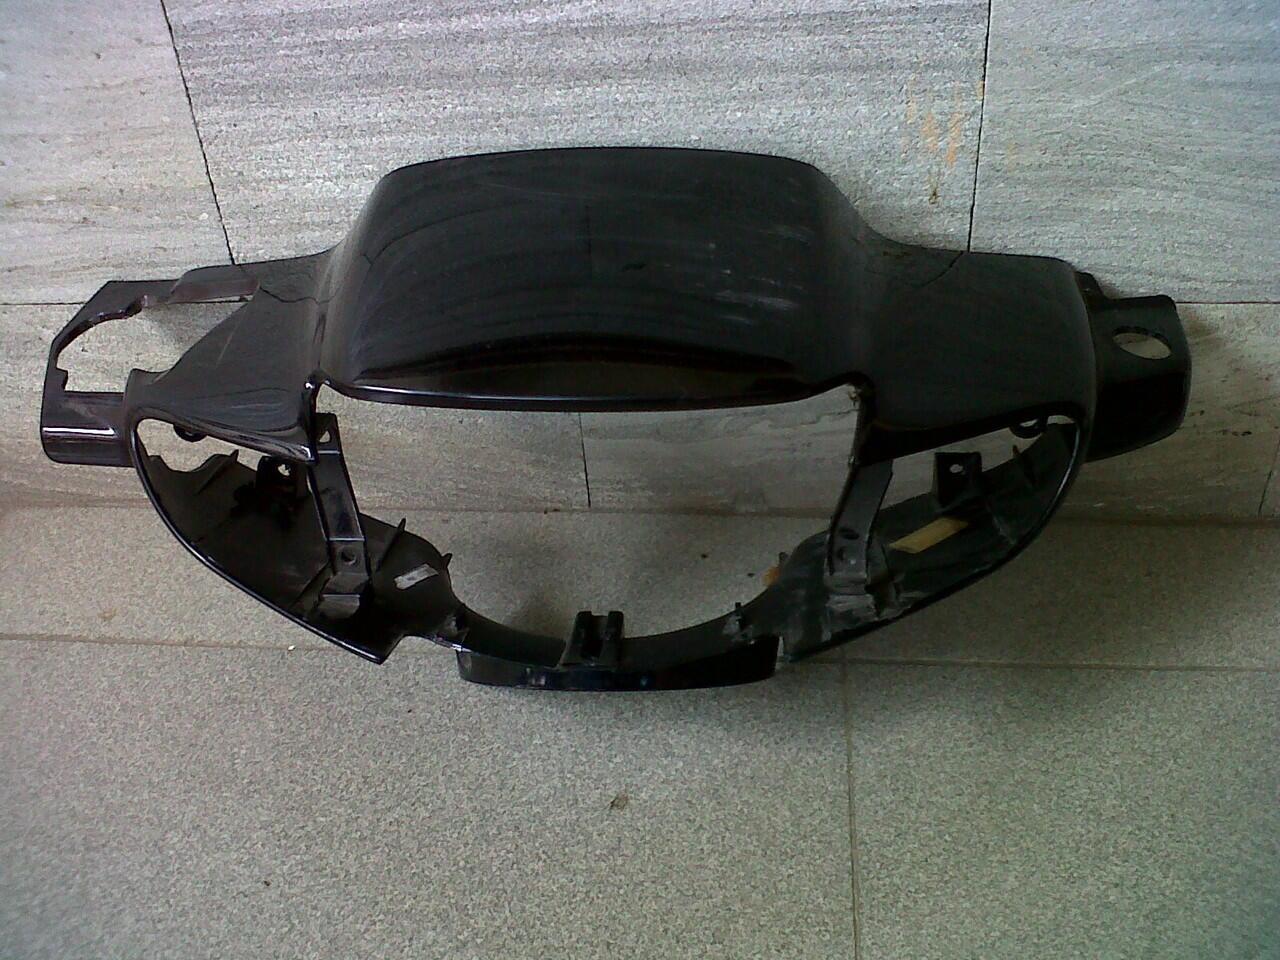 BURSA ONDERDIL MOTOR / Jual - Beli Sparepart Motor Ori - Kw Second / HARGA MIRING